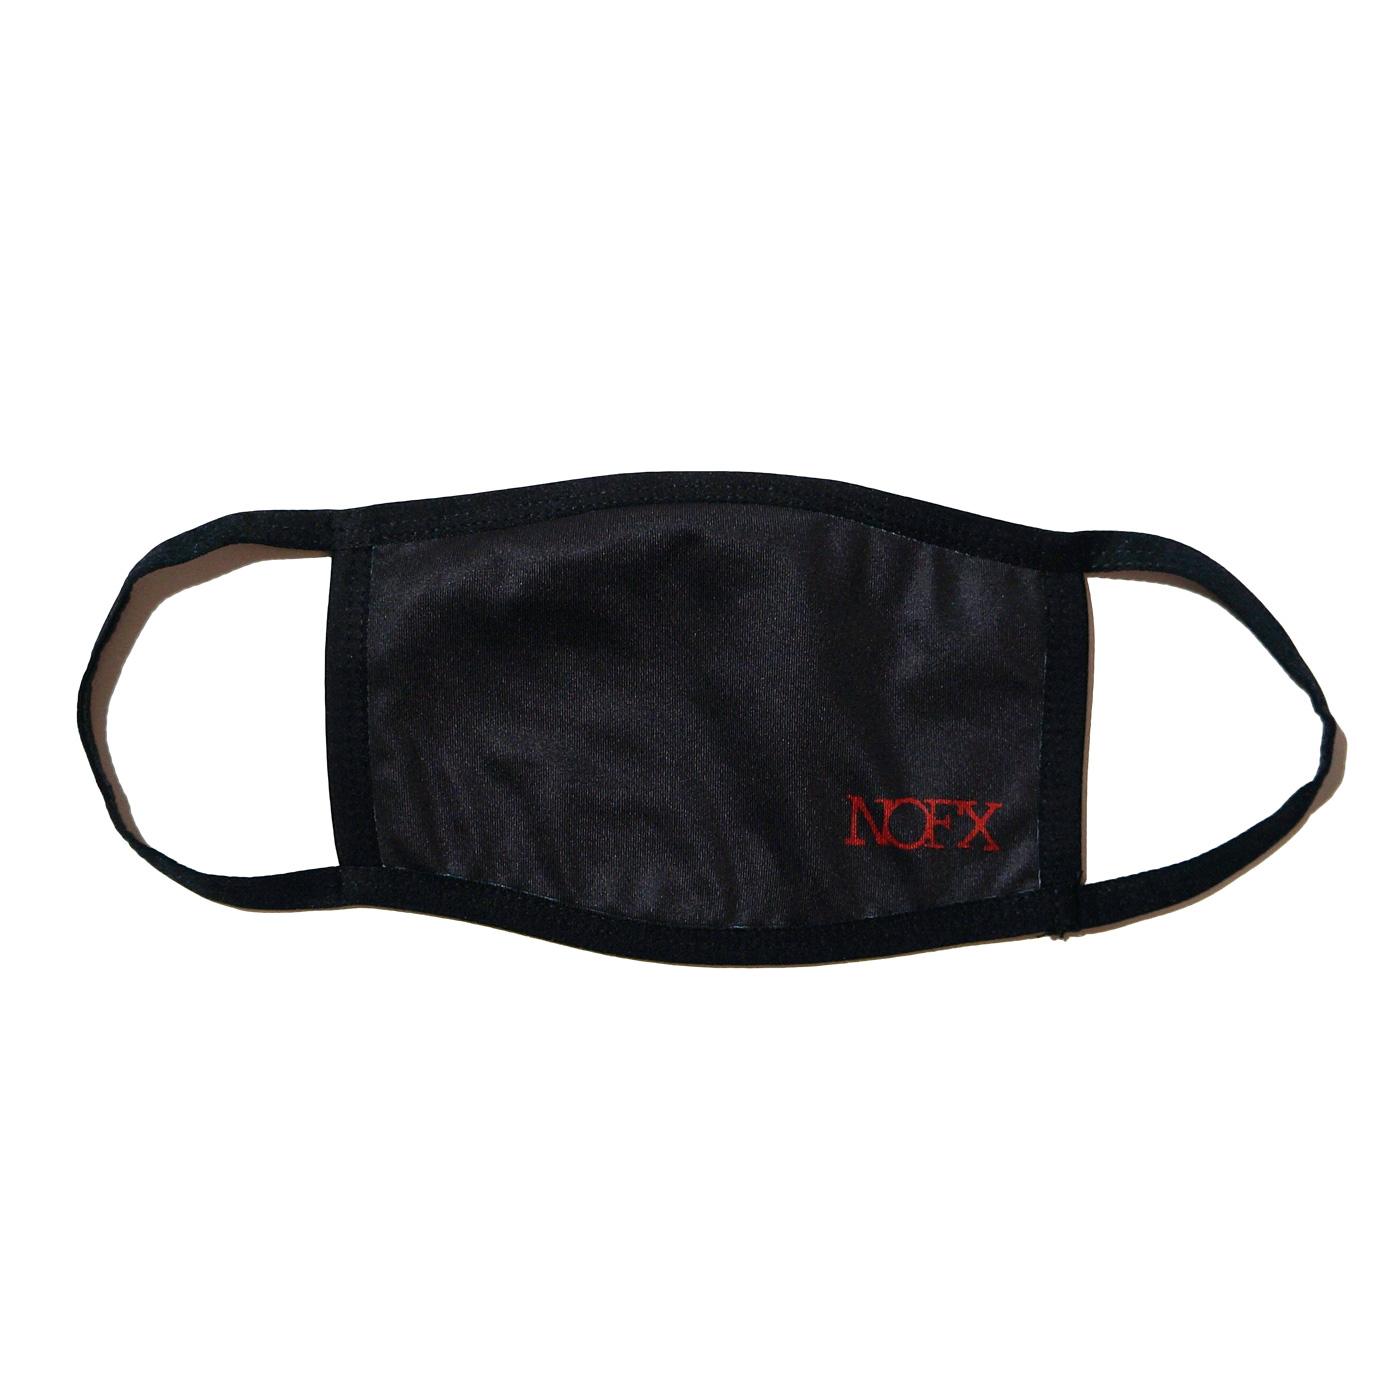 (SALE)NOFX フェイスマスク Mask Red Logo-Black